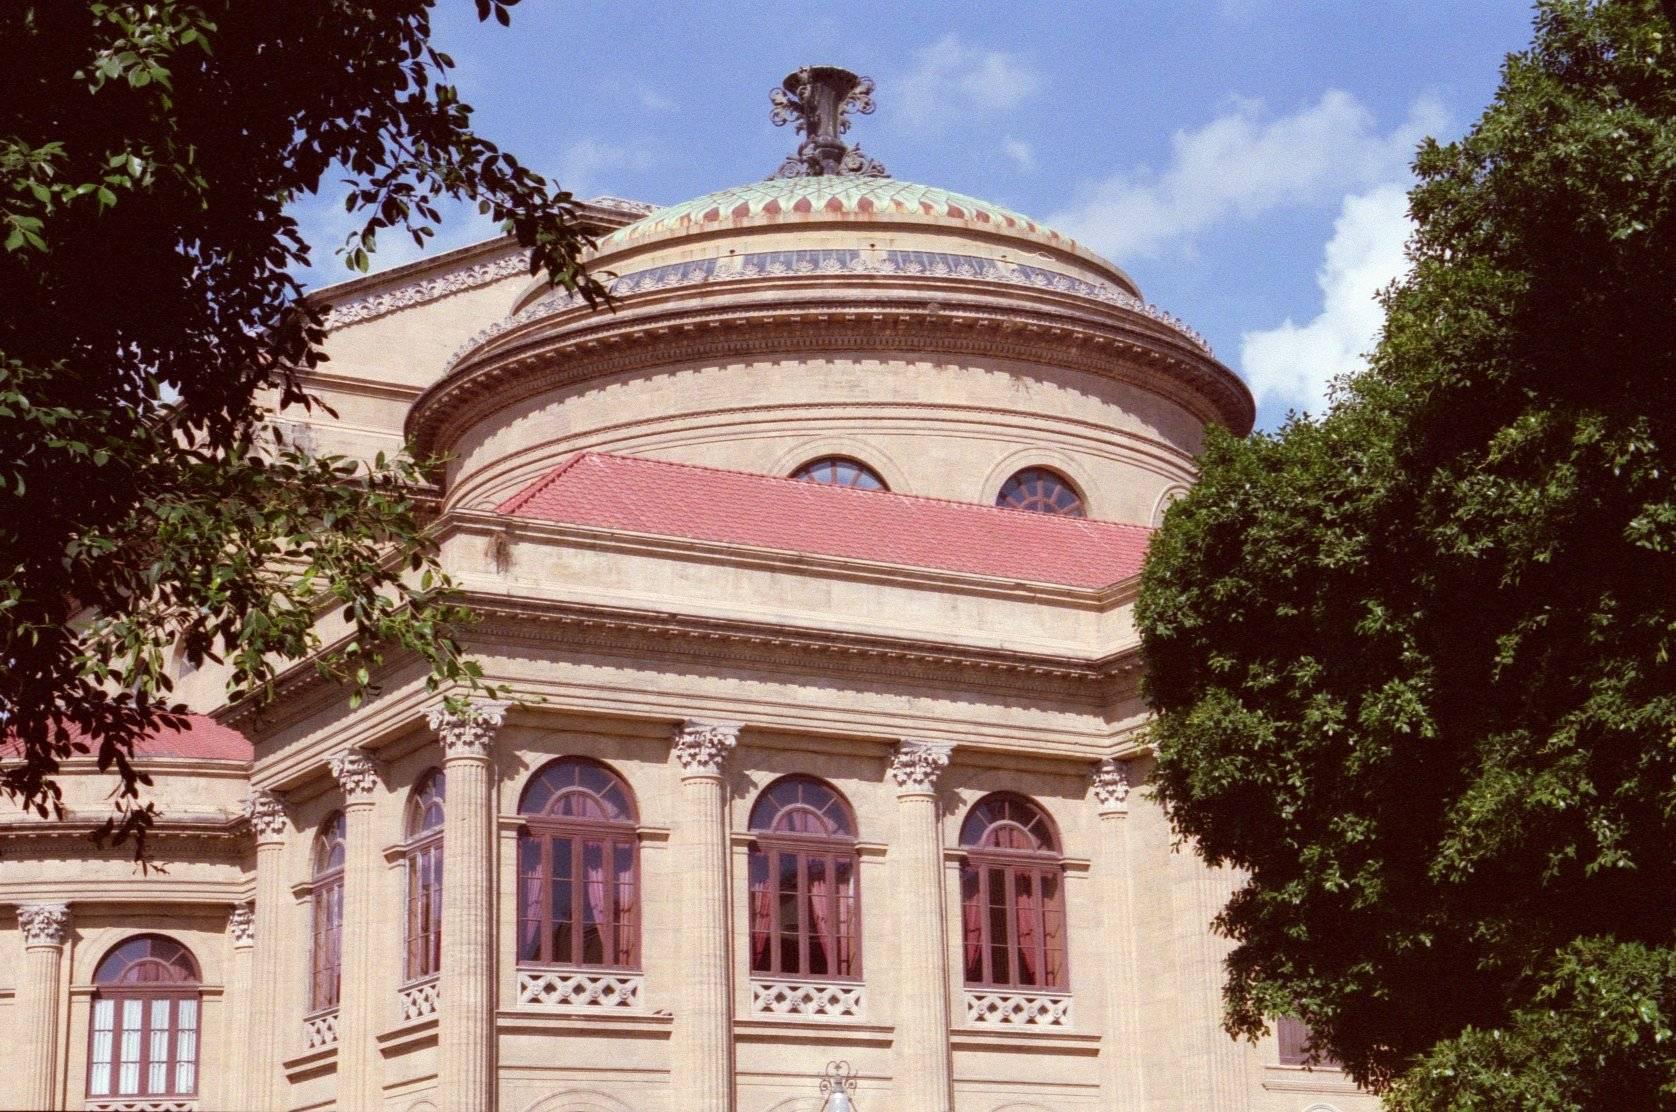 ref: A7 Teatro Massimo ' opera house '